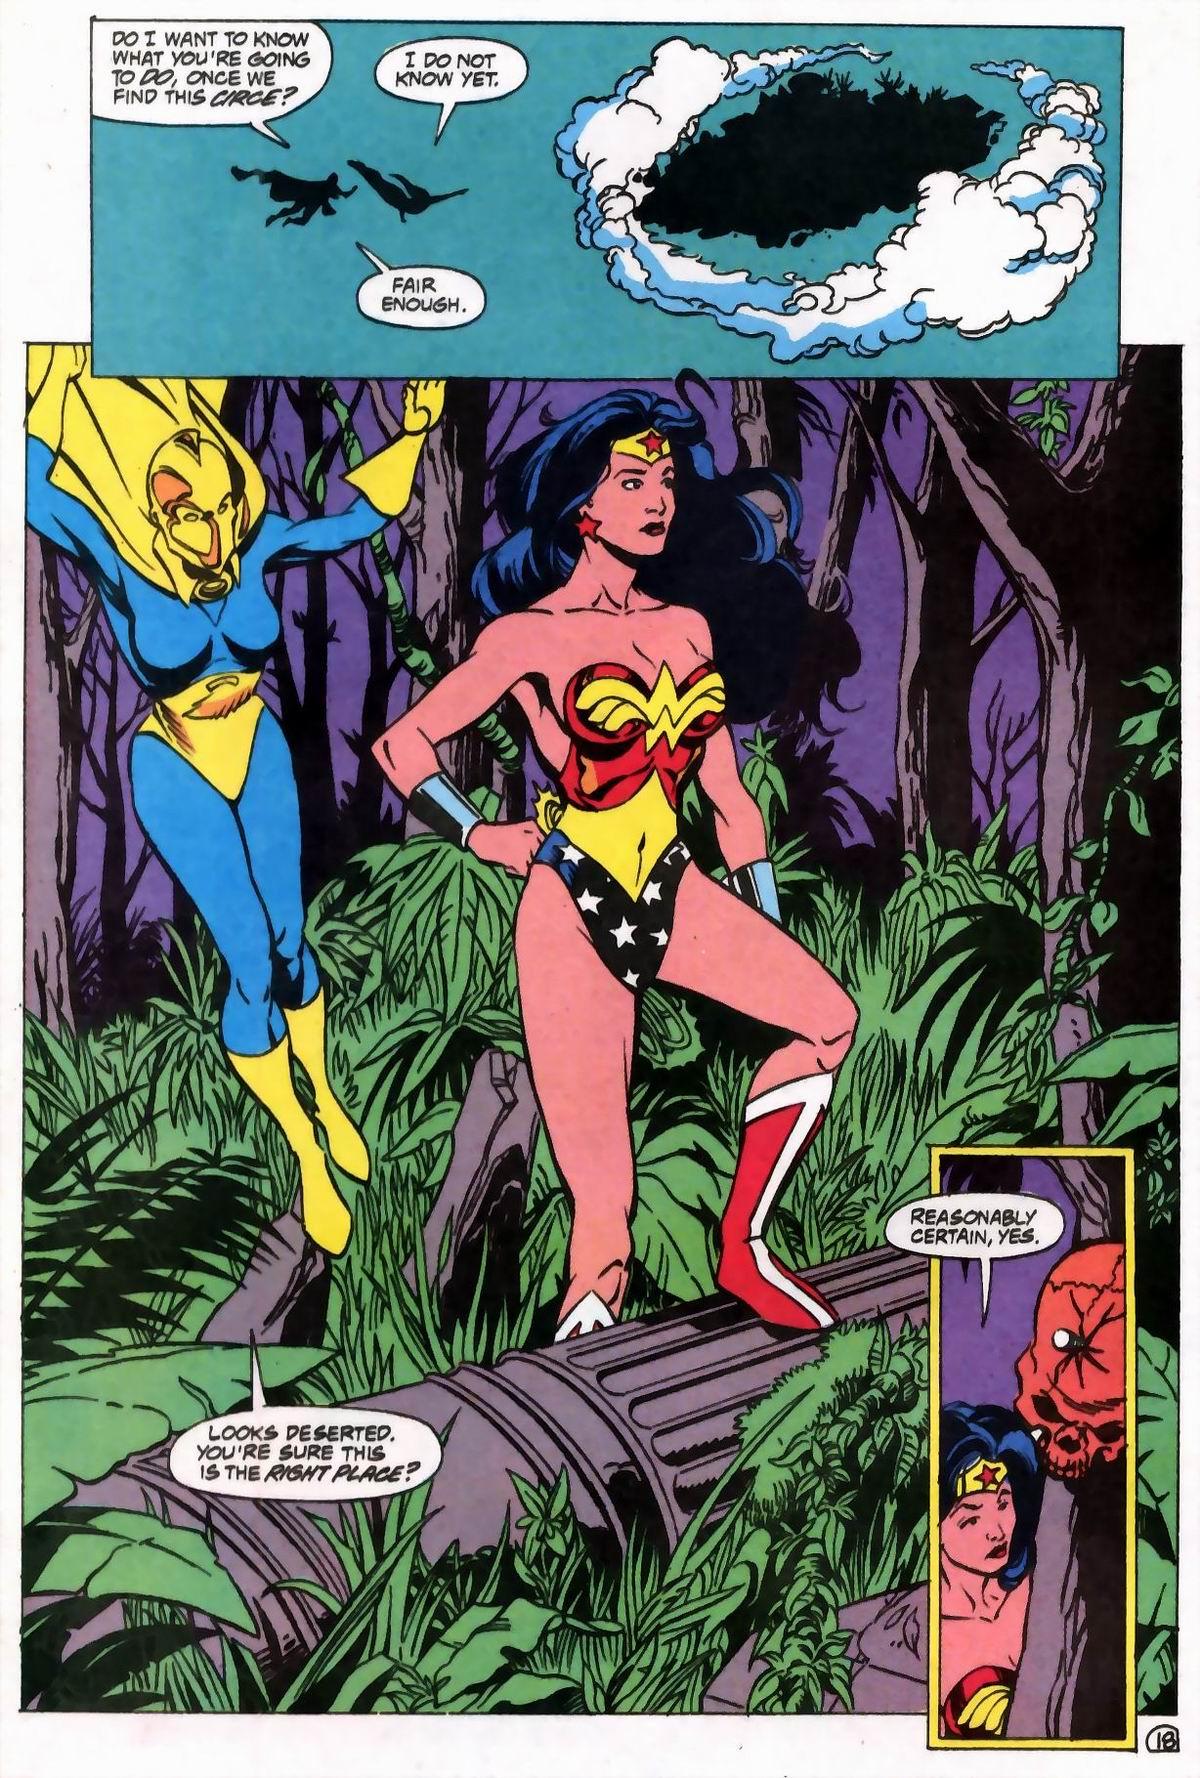 Read online Wonder Woman (1987) comic -  Issue #76 - 18